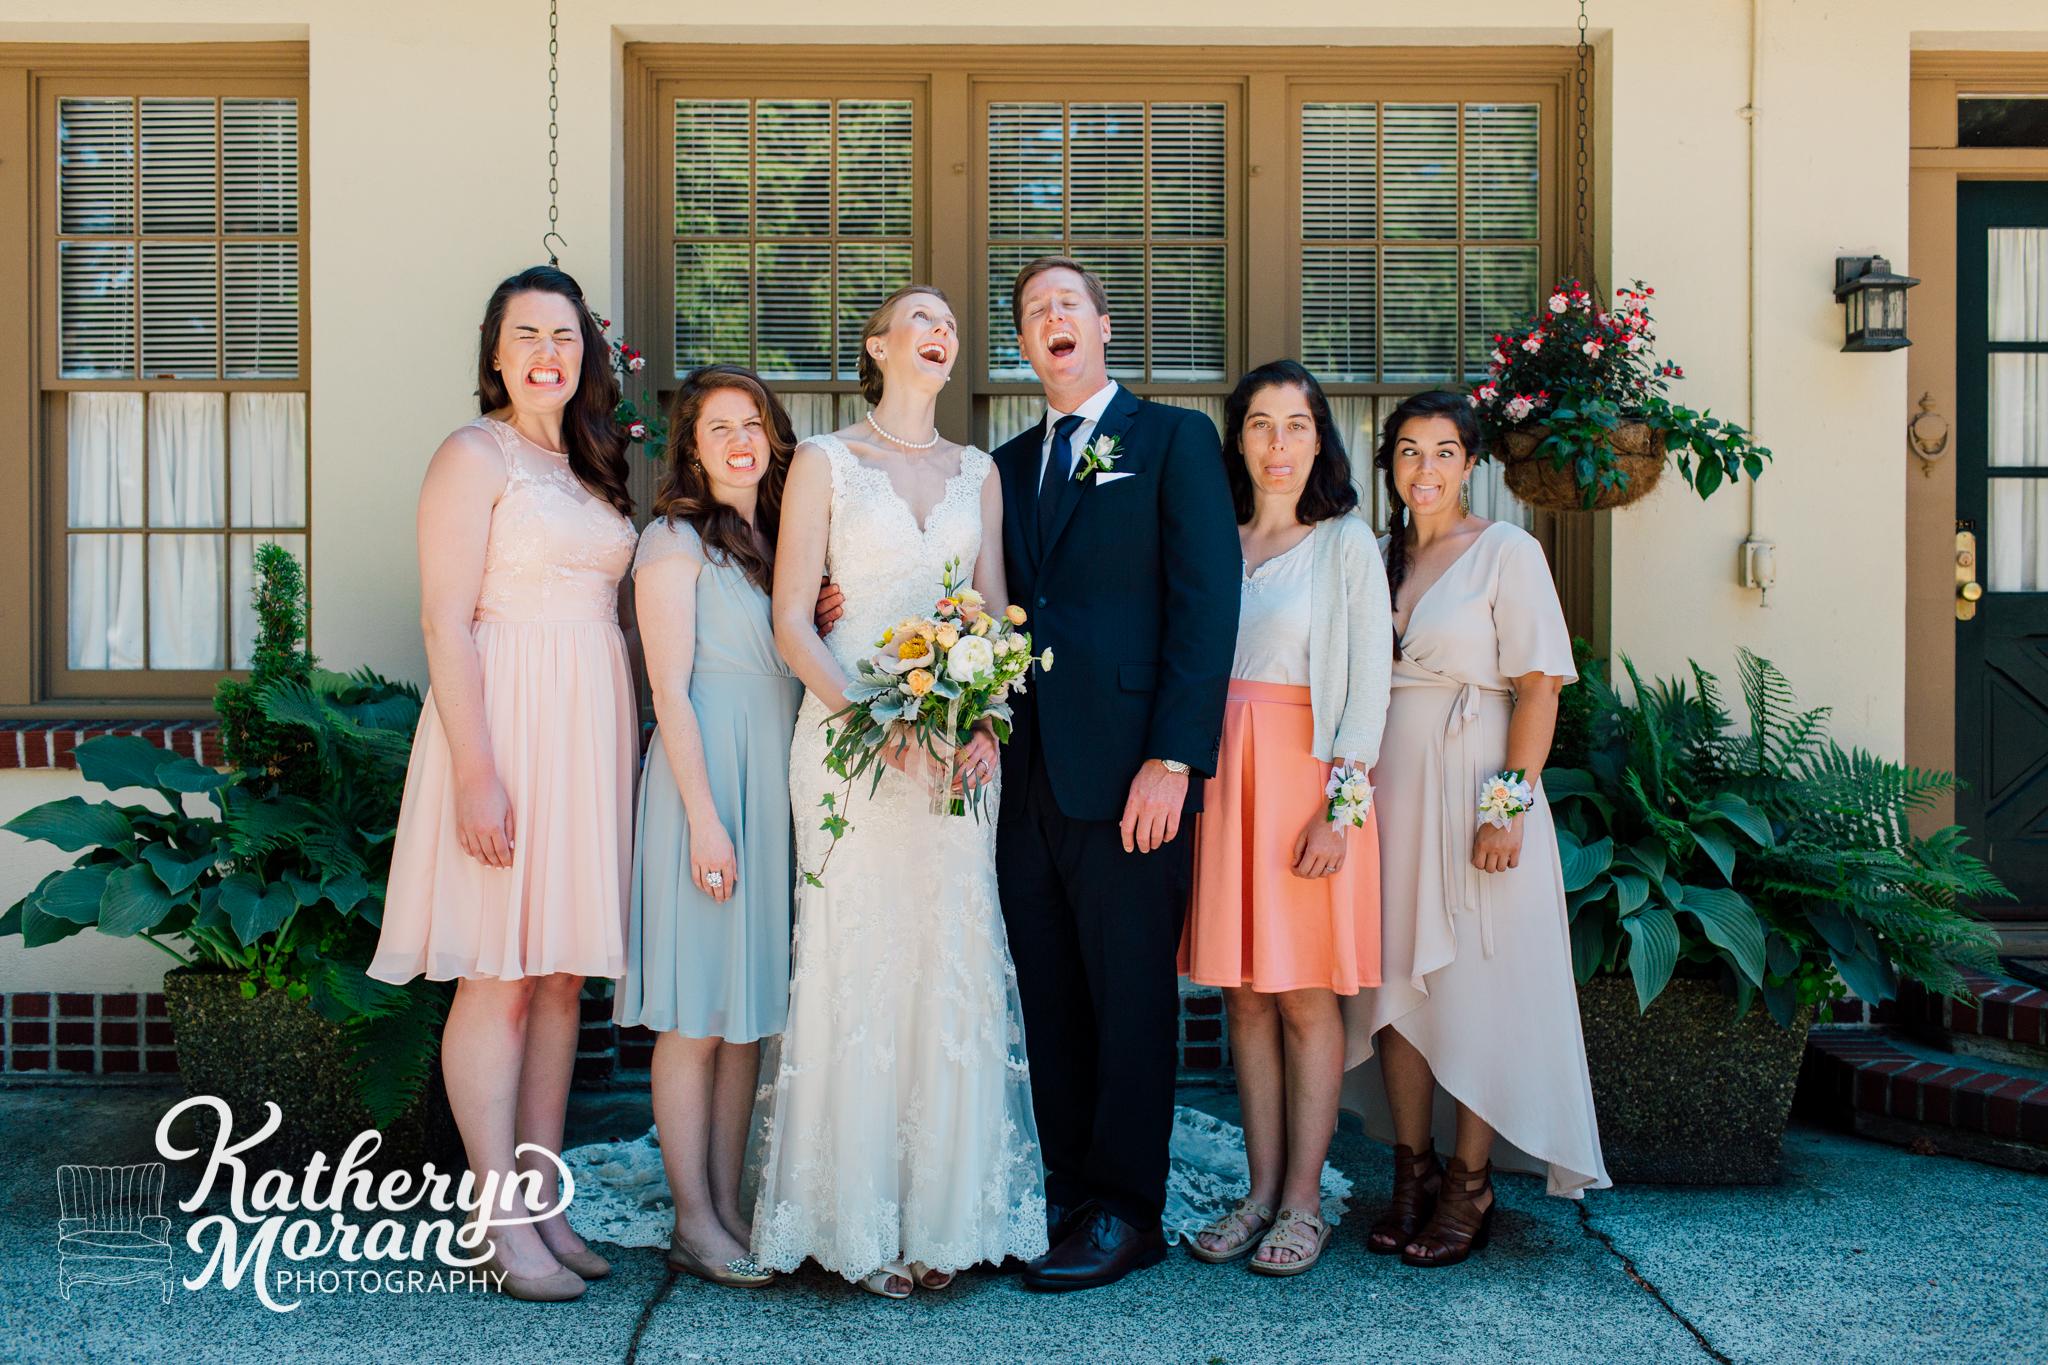 bellingham-wedding-photographer-lairmont-manor-katheryn-moran-12.jpg